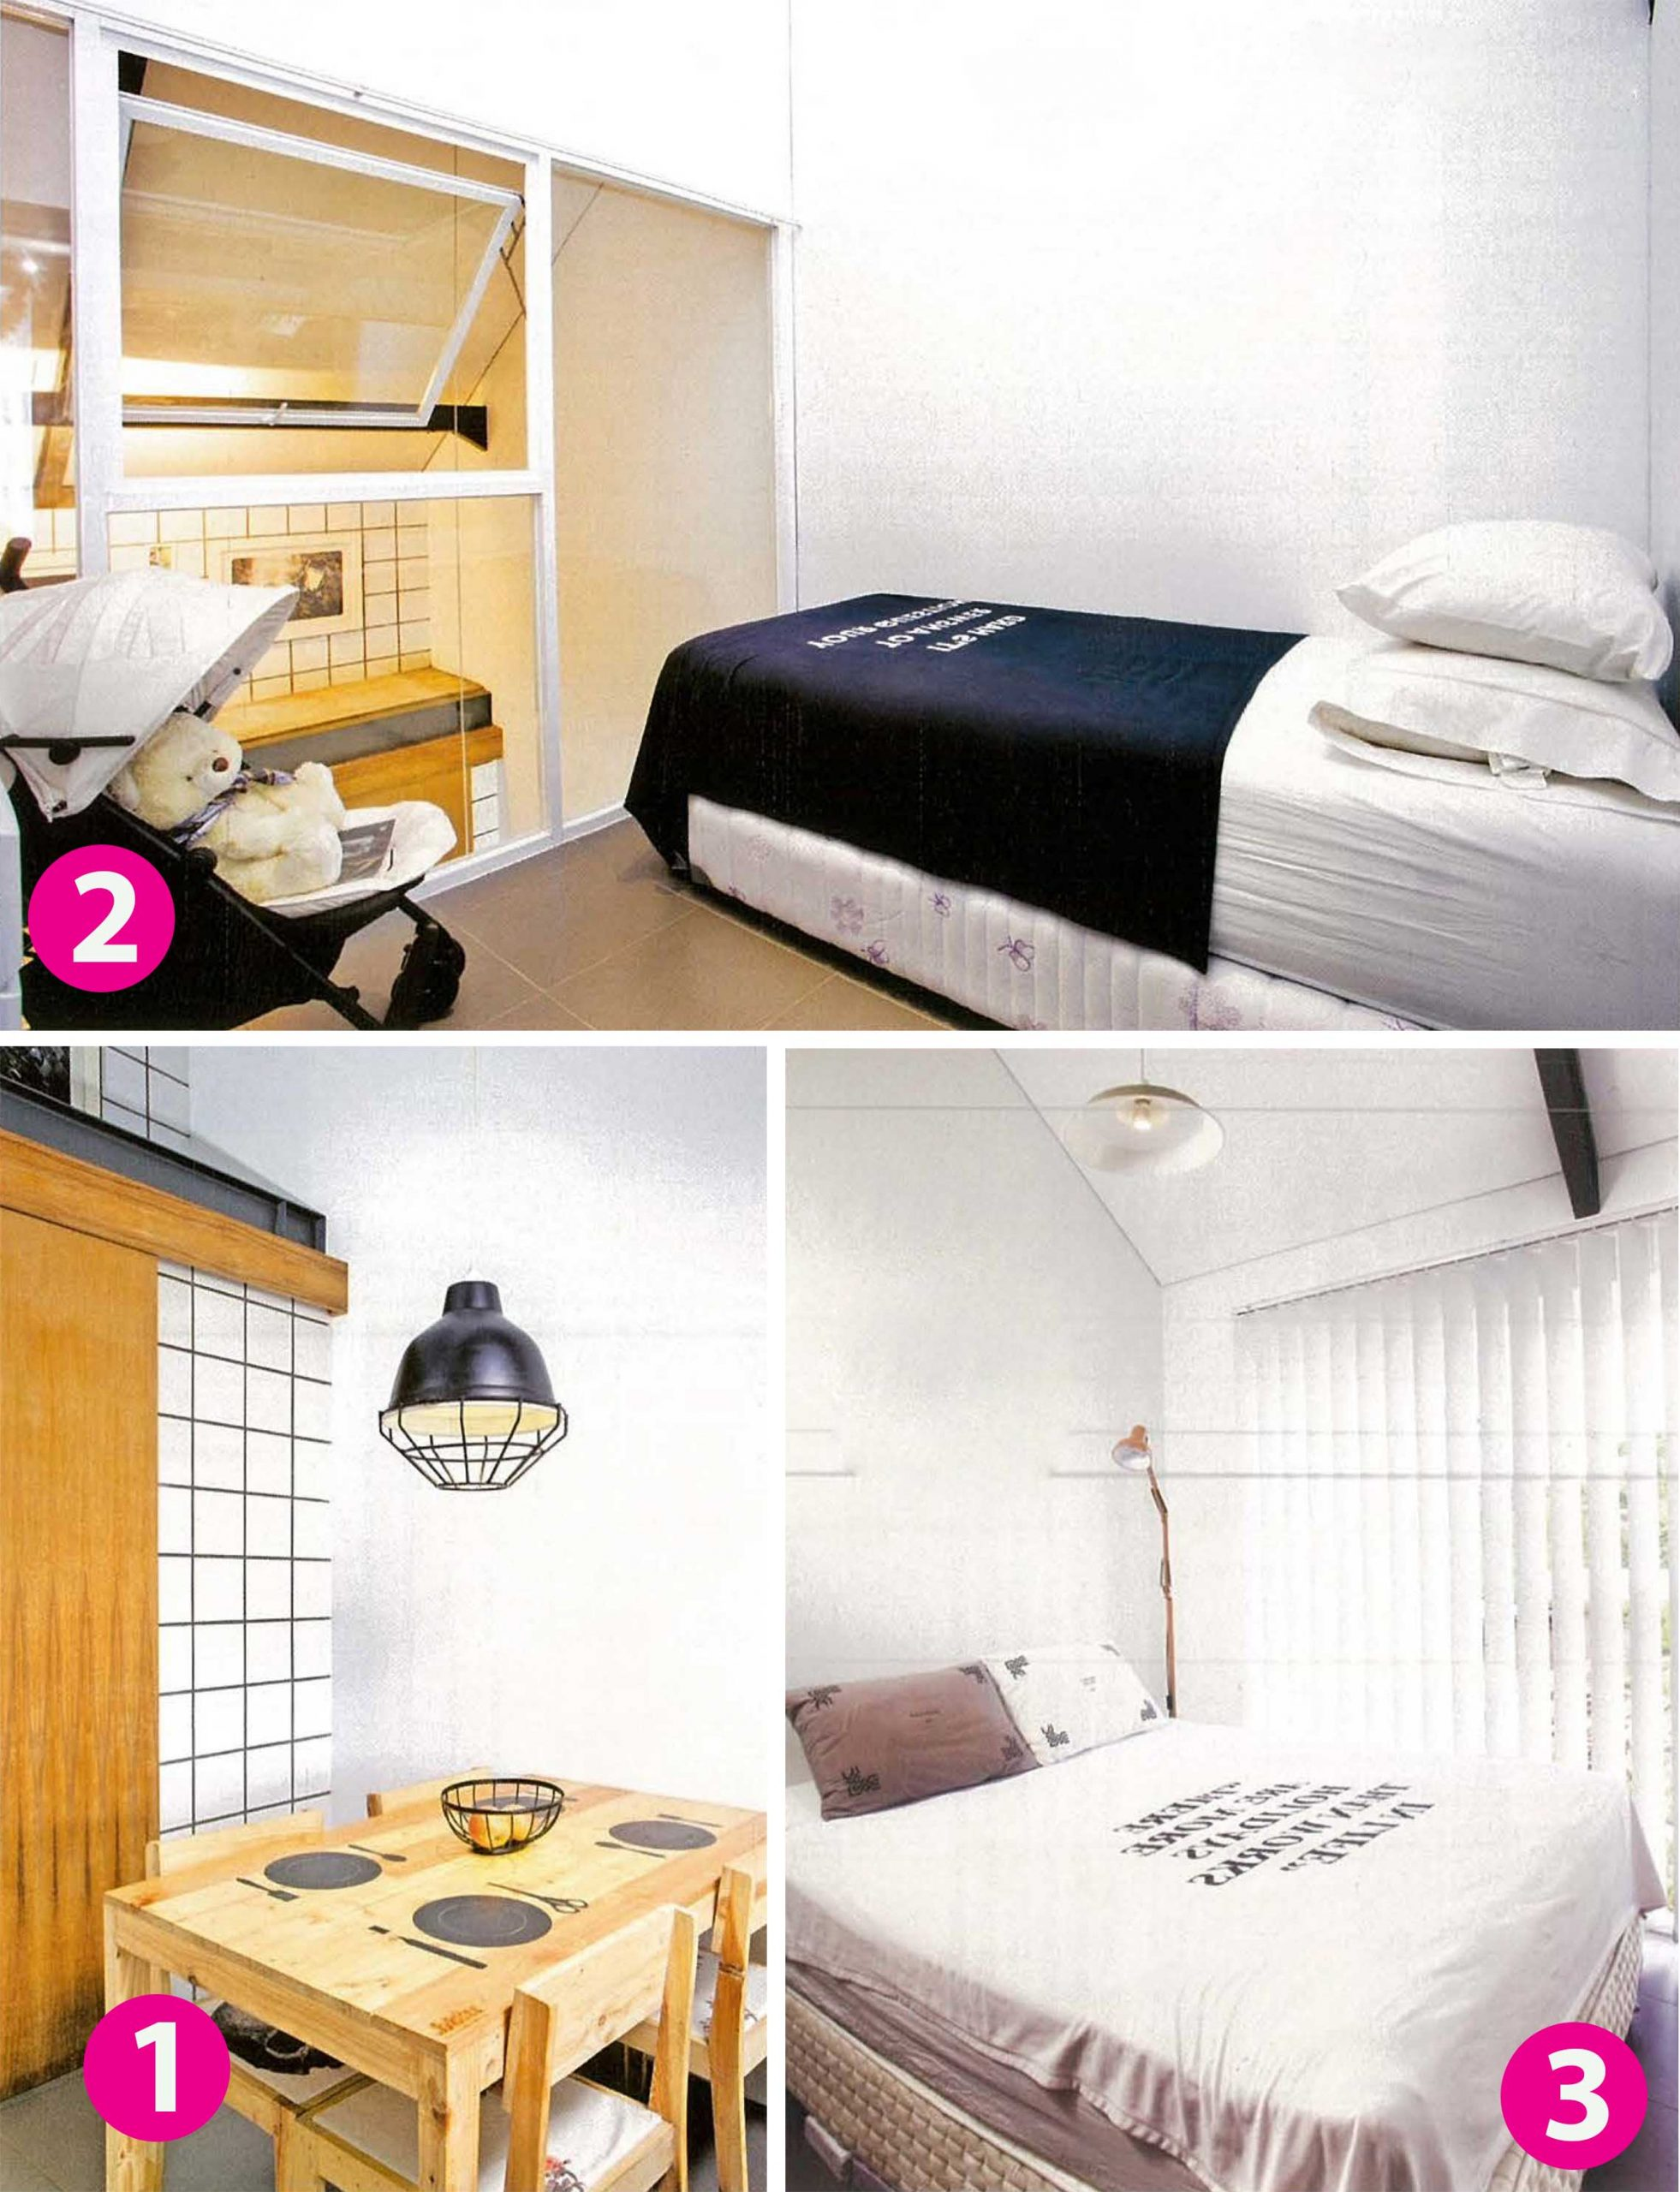 Small House Design With Mezzanine Concept | Roy Home Design